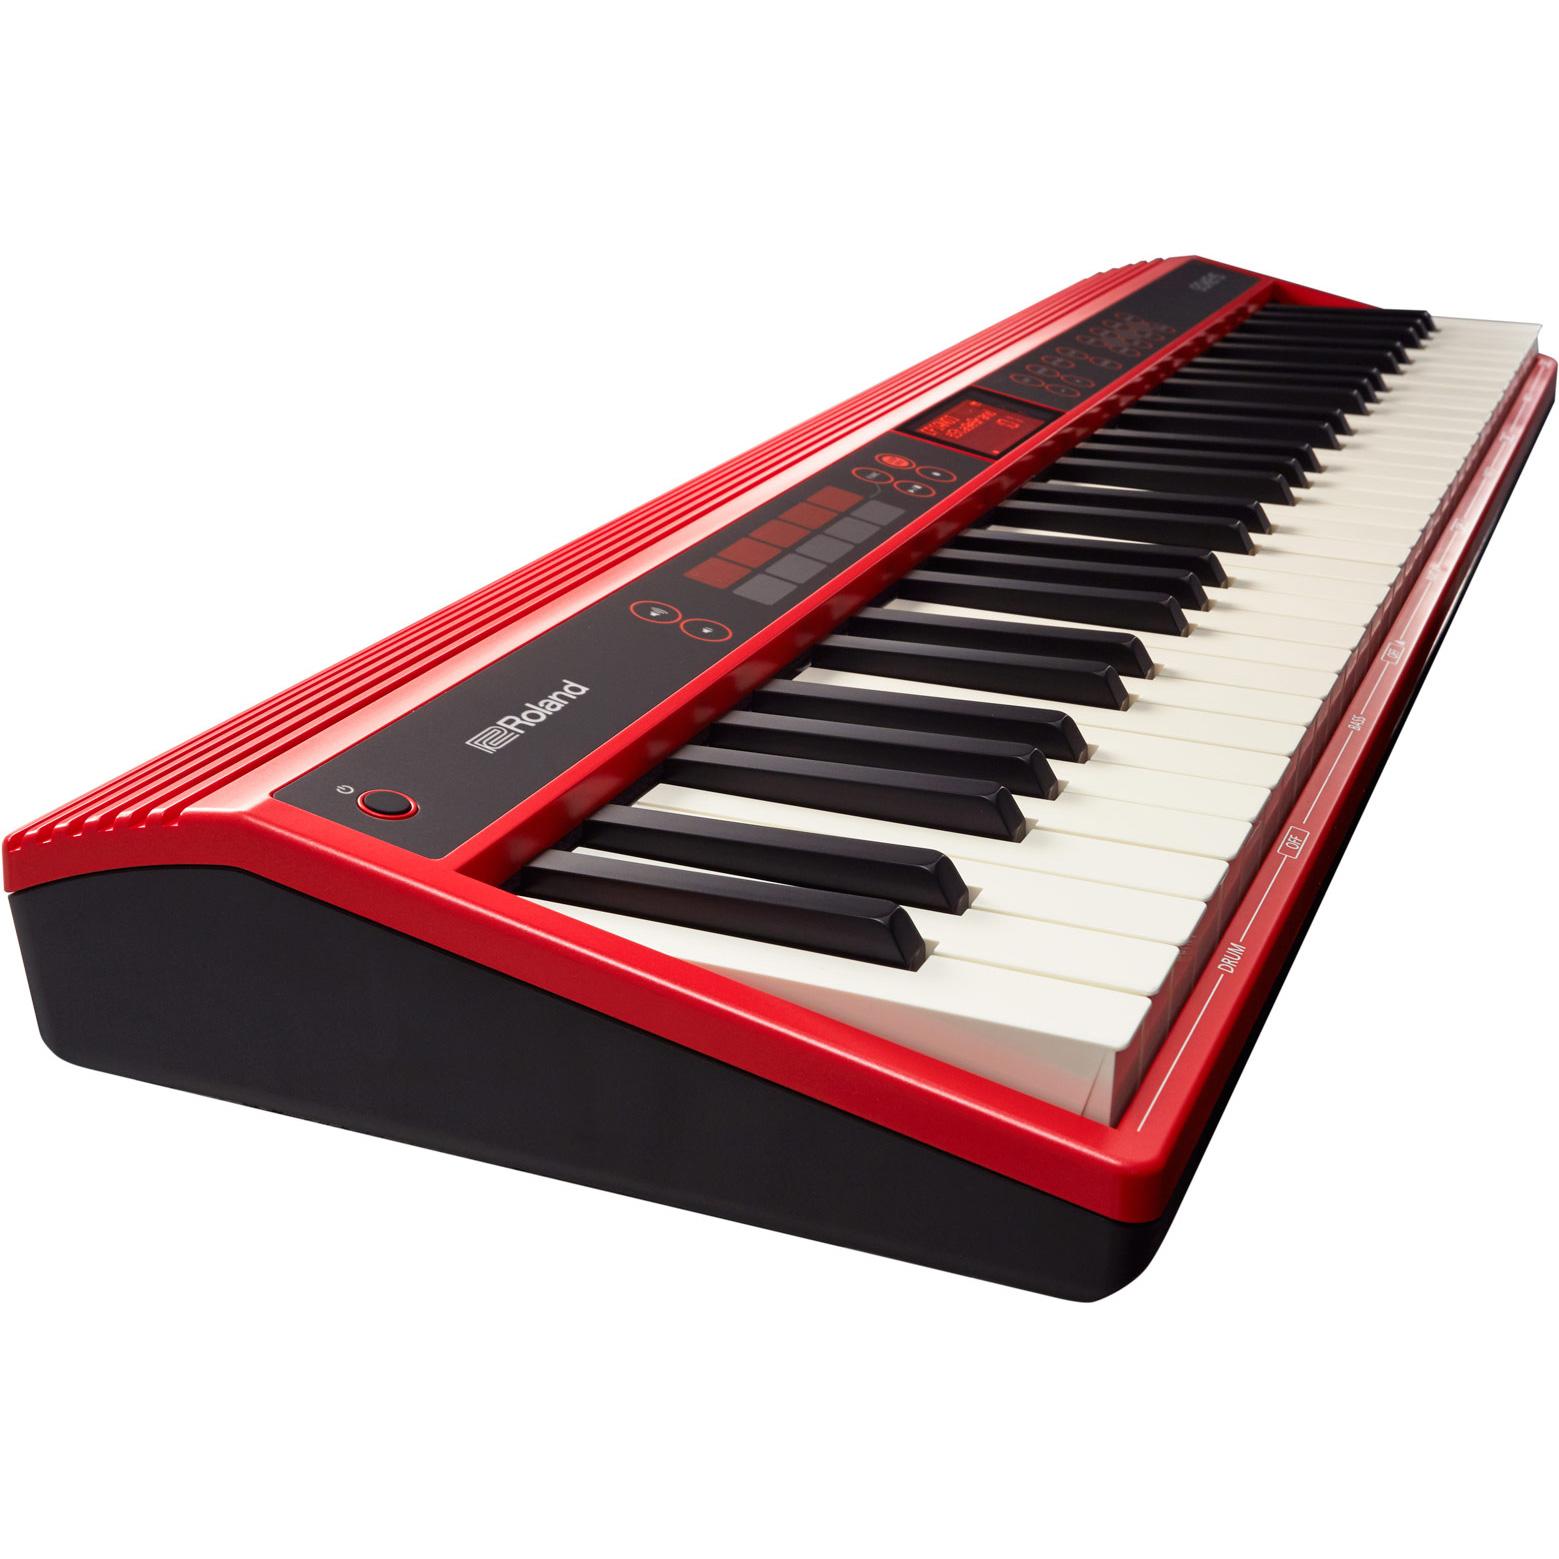 Roland GO:KEYS Music Creation Keyboard (GO-61K), cena:370 00